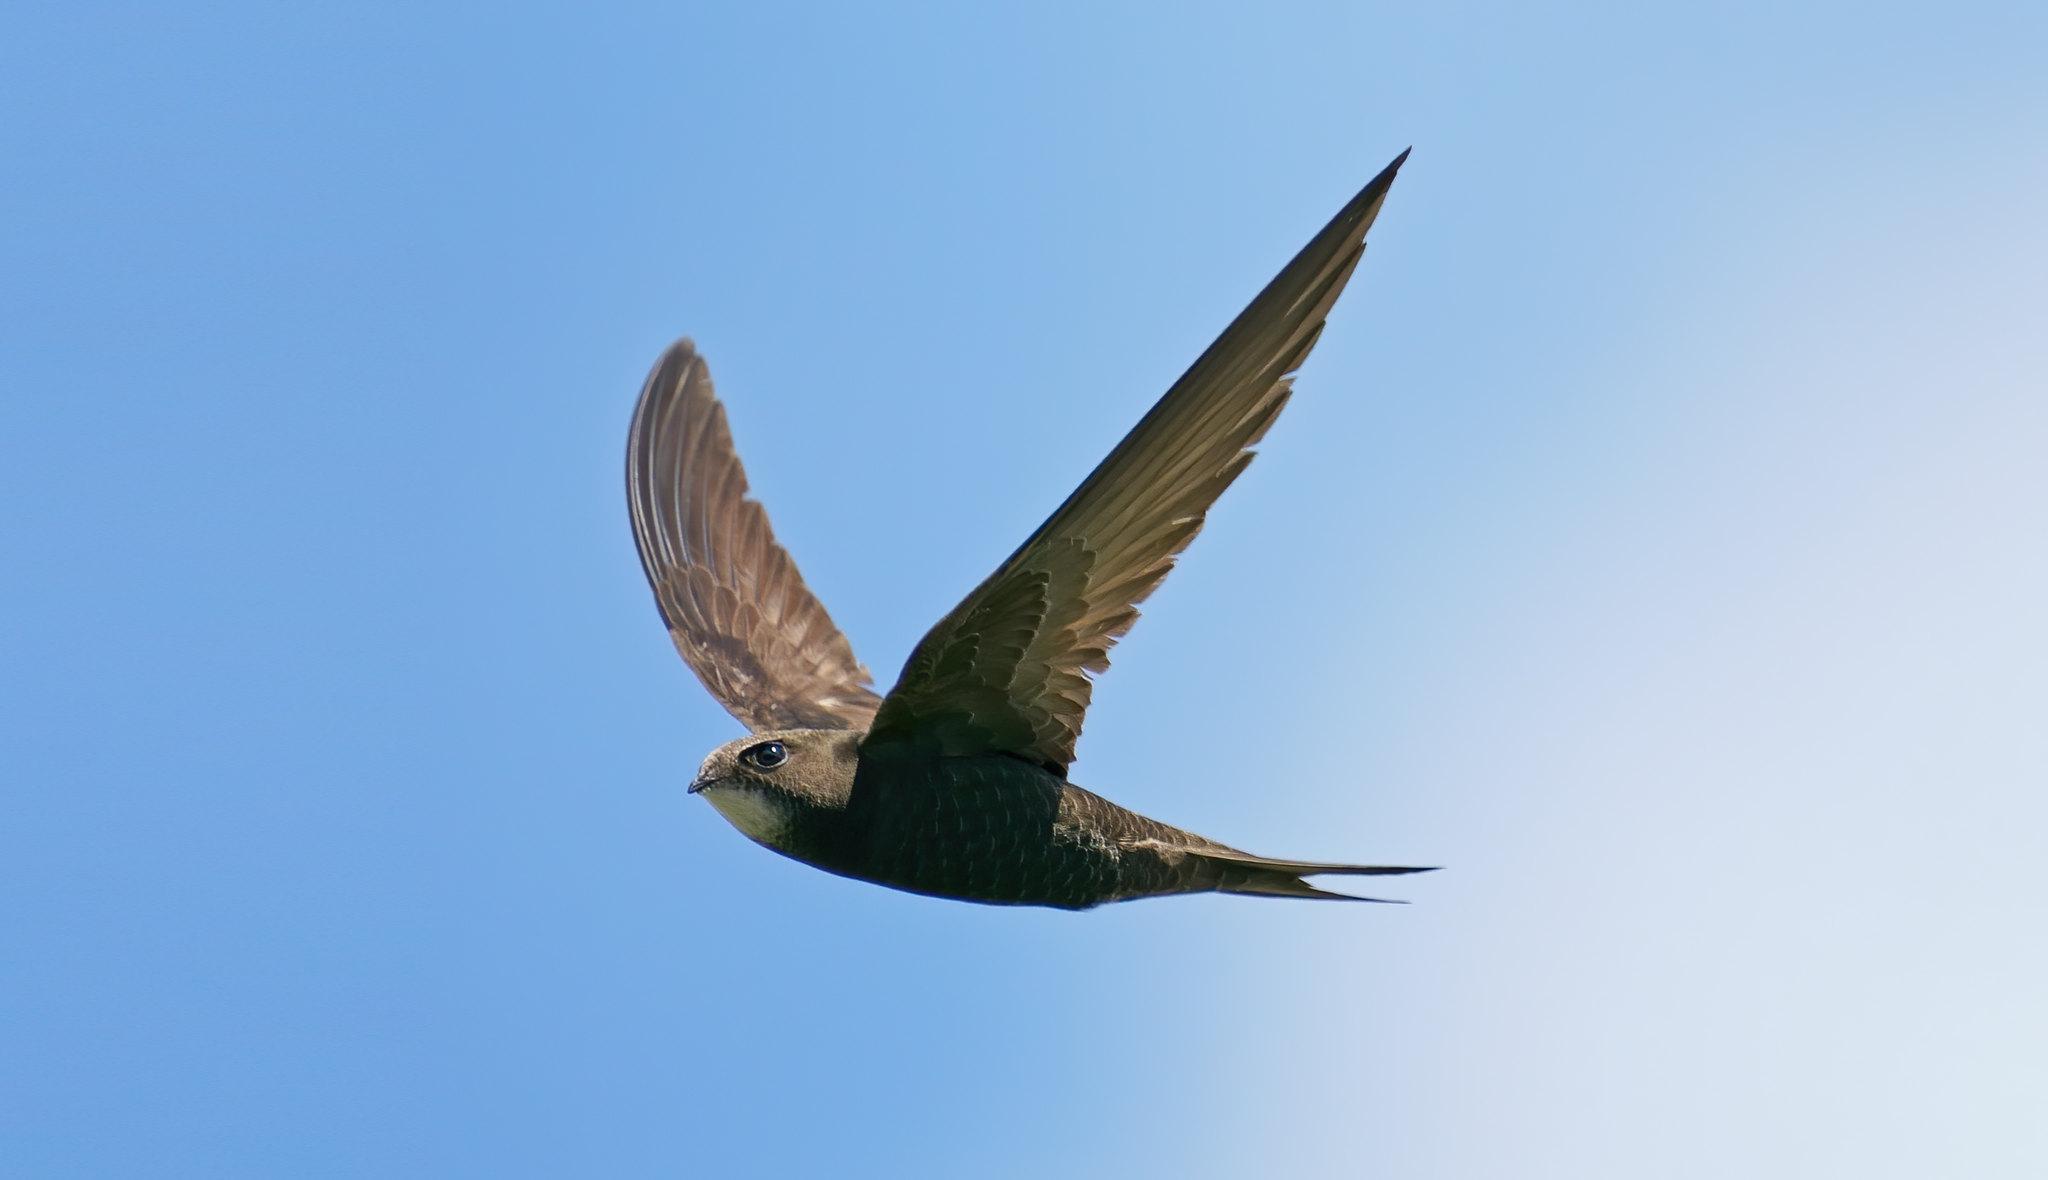 Common Swift - needed more speed to freeze. :-(